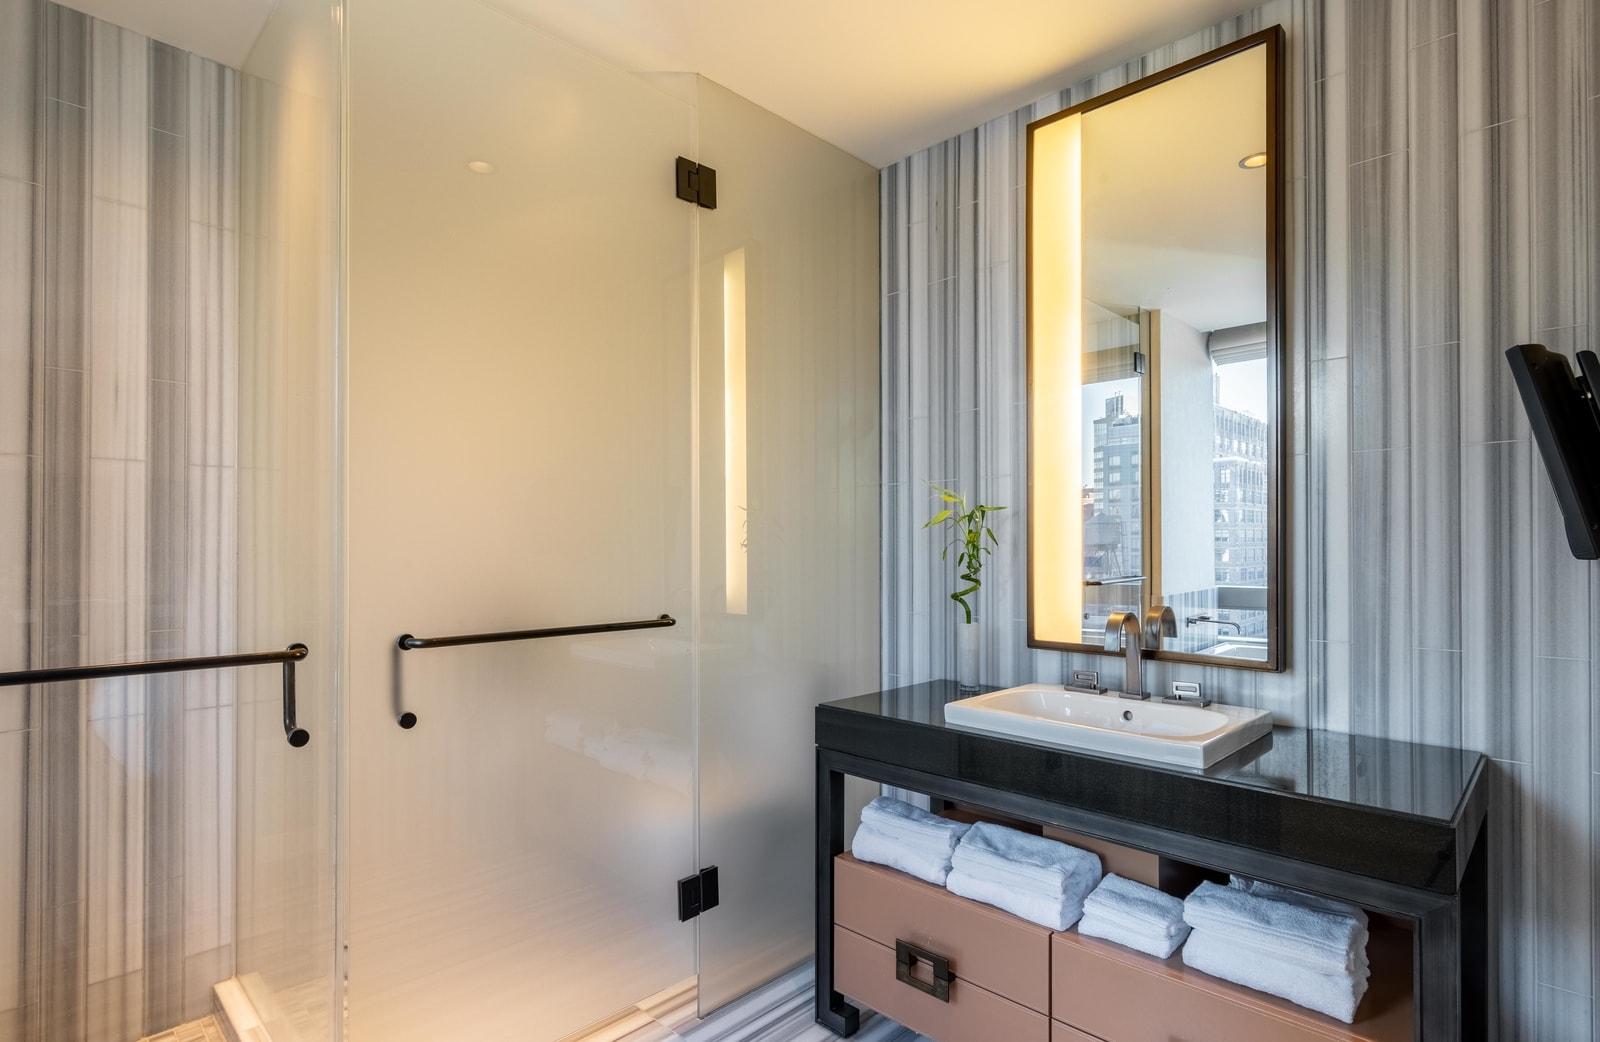 studio-luxe-a-vendre-immeuble-standing-dominick-soho-manhattan-entierement-meuble-baies-vitrees-vue-imprenable